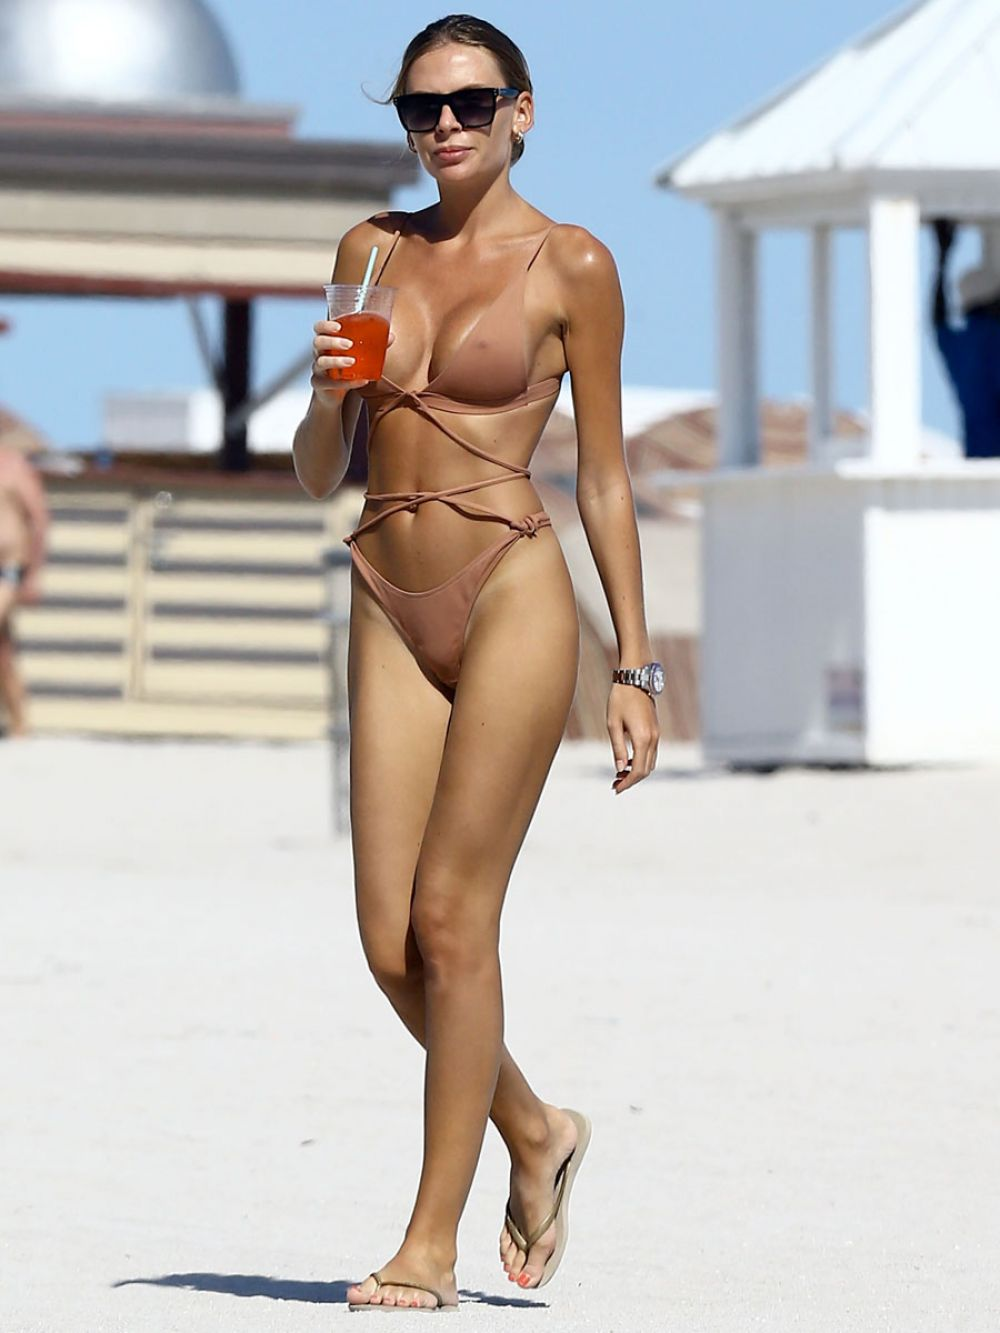 ANASTASIA SKYLINE in Bikini at a Beach in Miami 01/24/2017